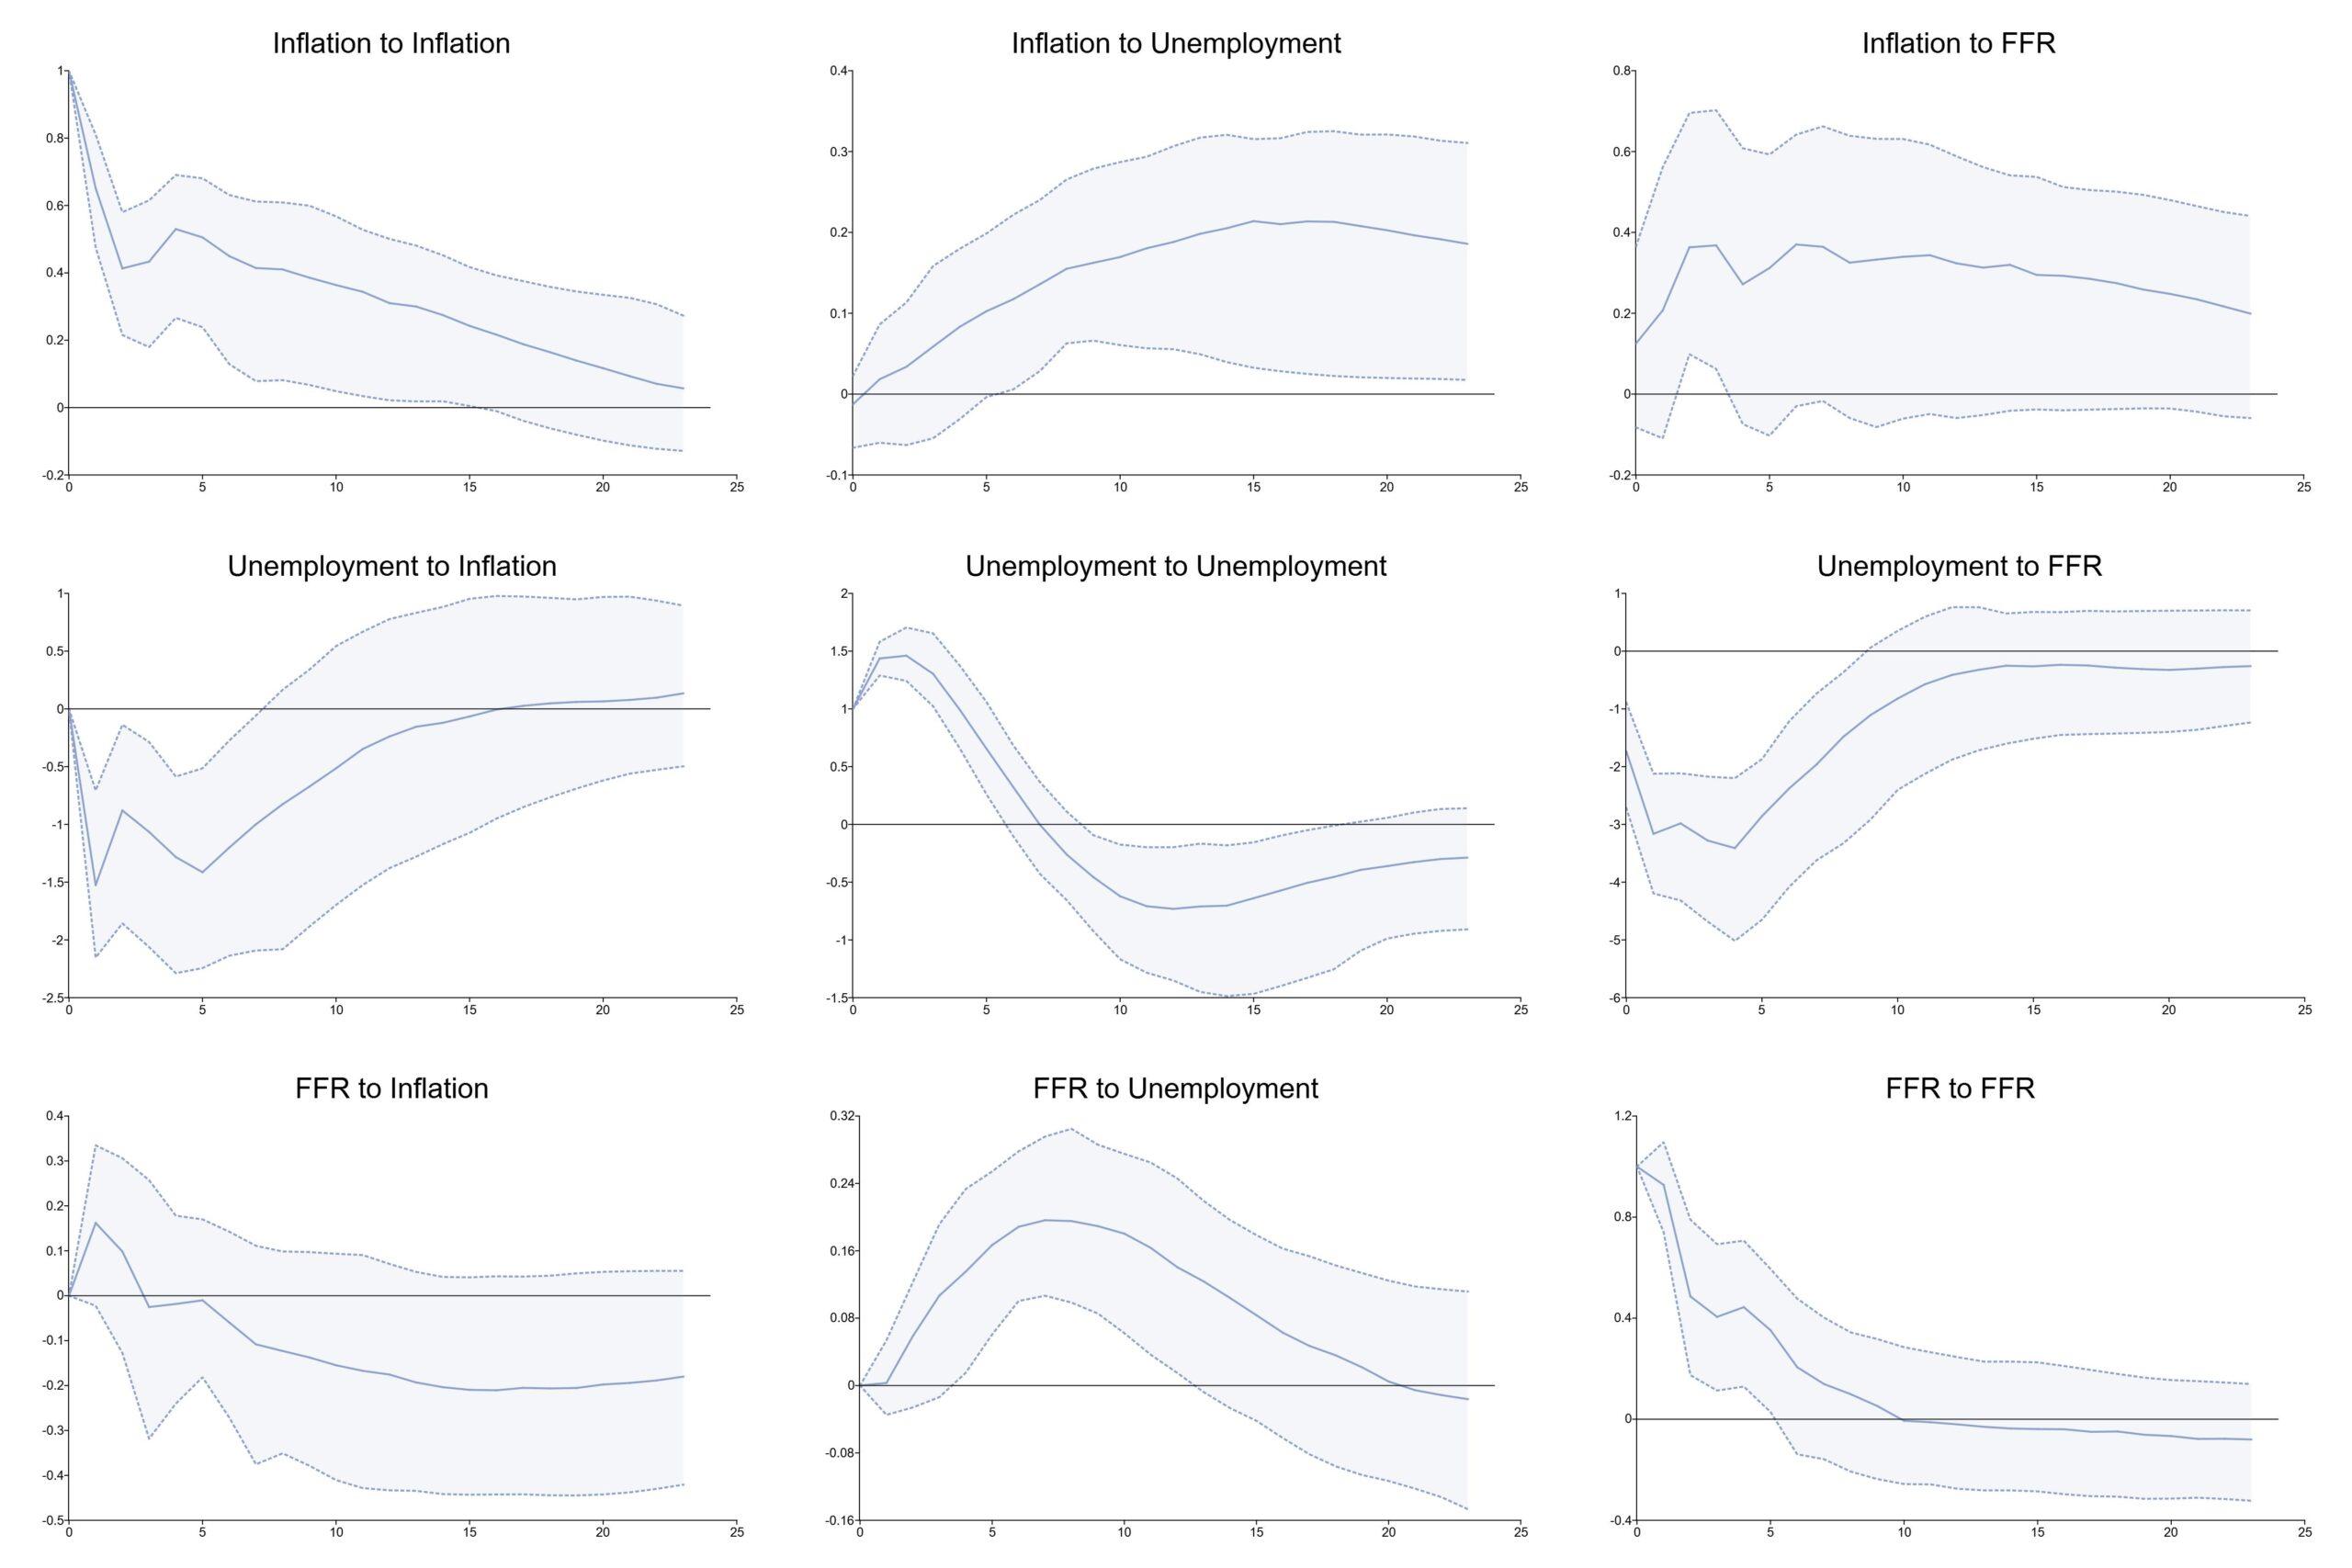 Impulse response function demonstrating monetary policy impacts on macroeconomic indicators.